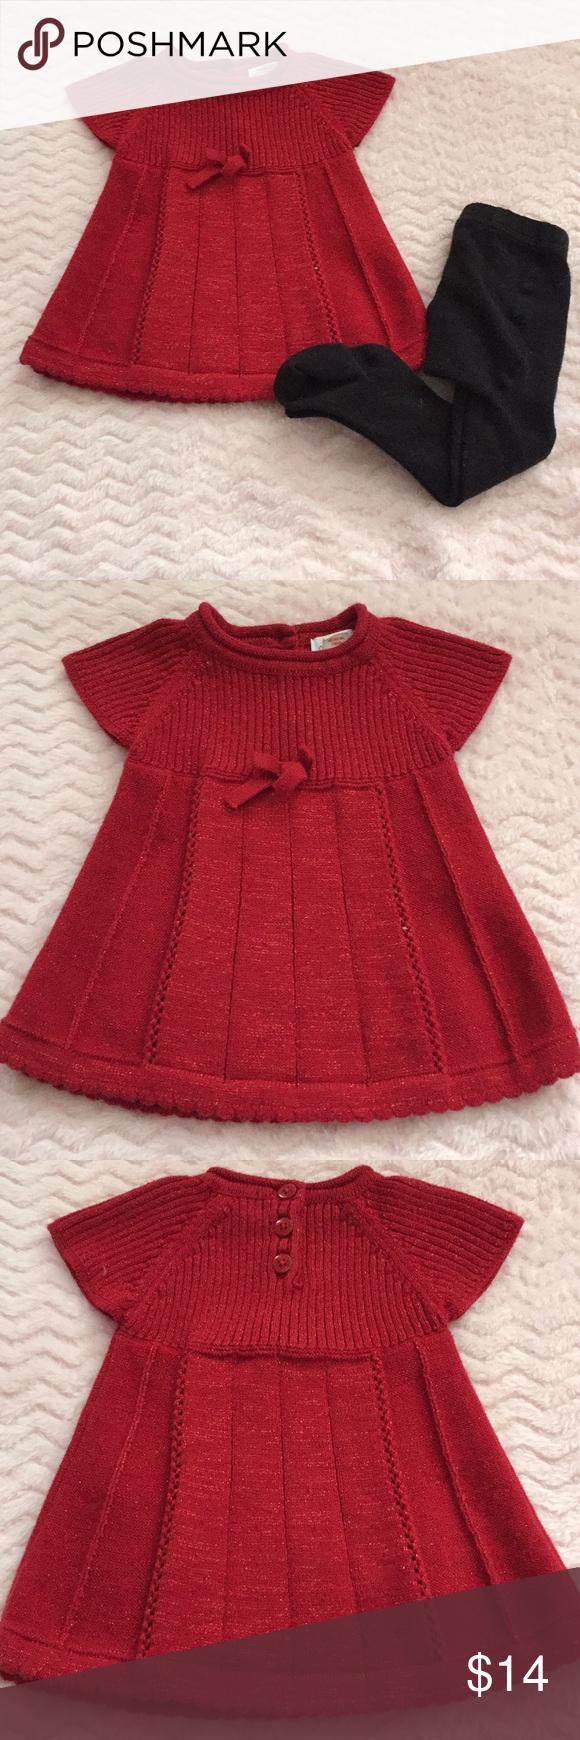 Baby Christmas sweater dress and tights Christmas